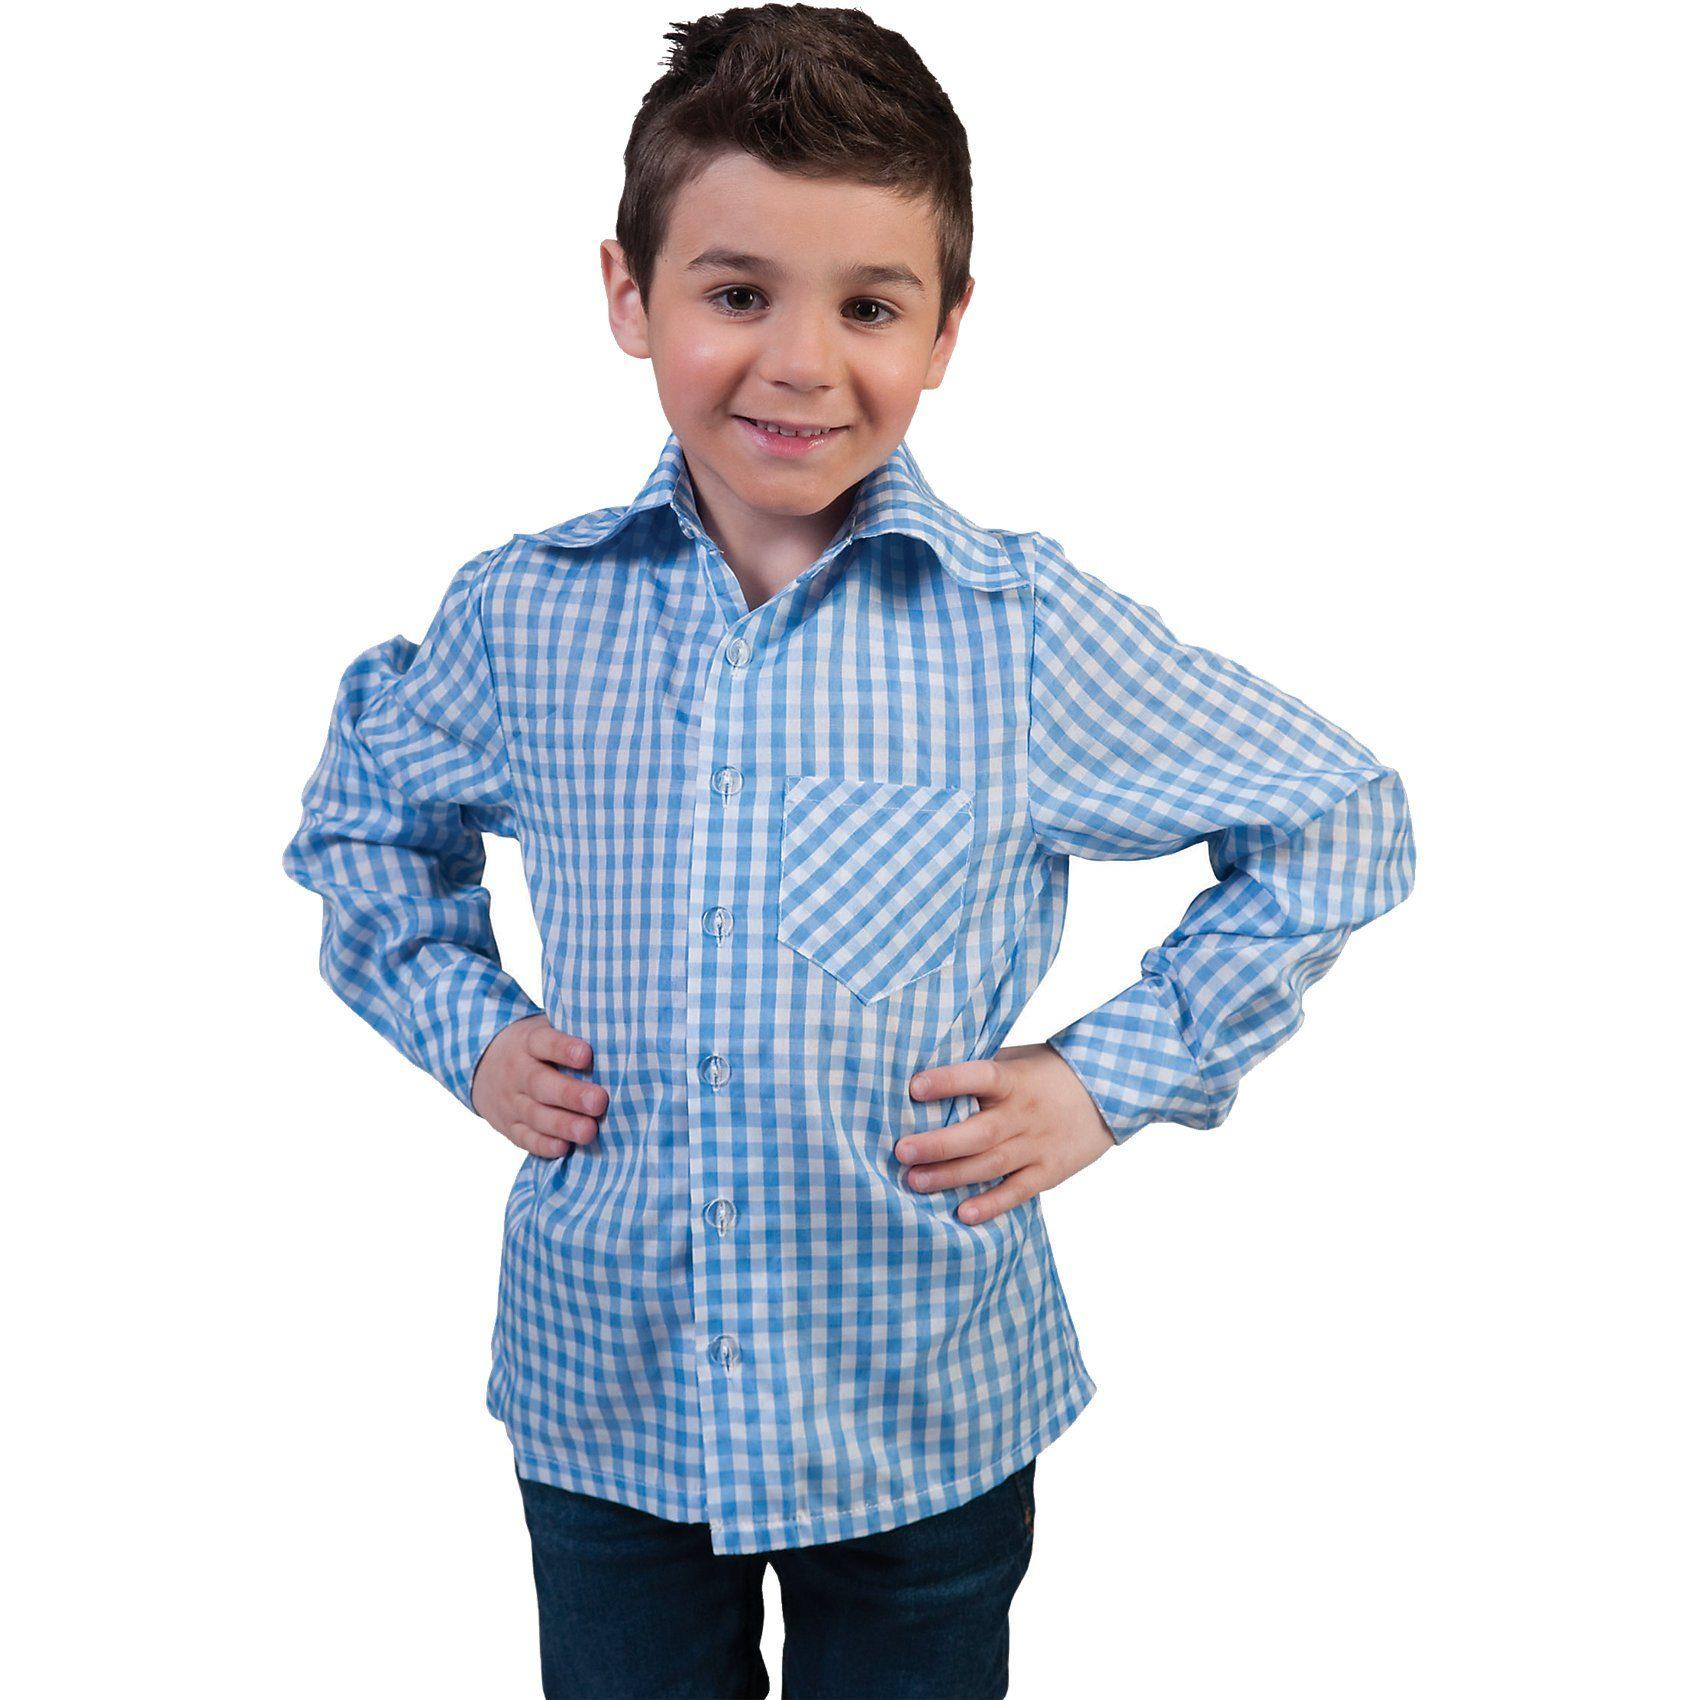 Funny Fashion Kostüm kariertes Hemd blau